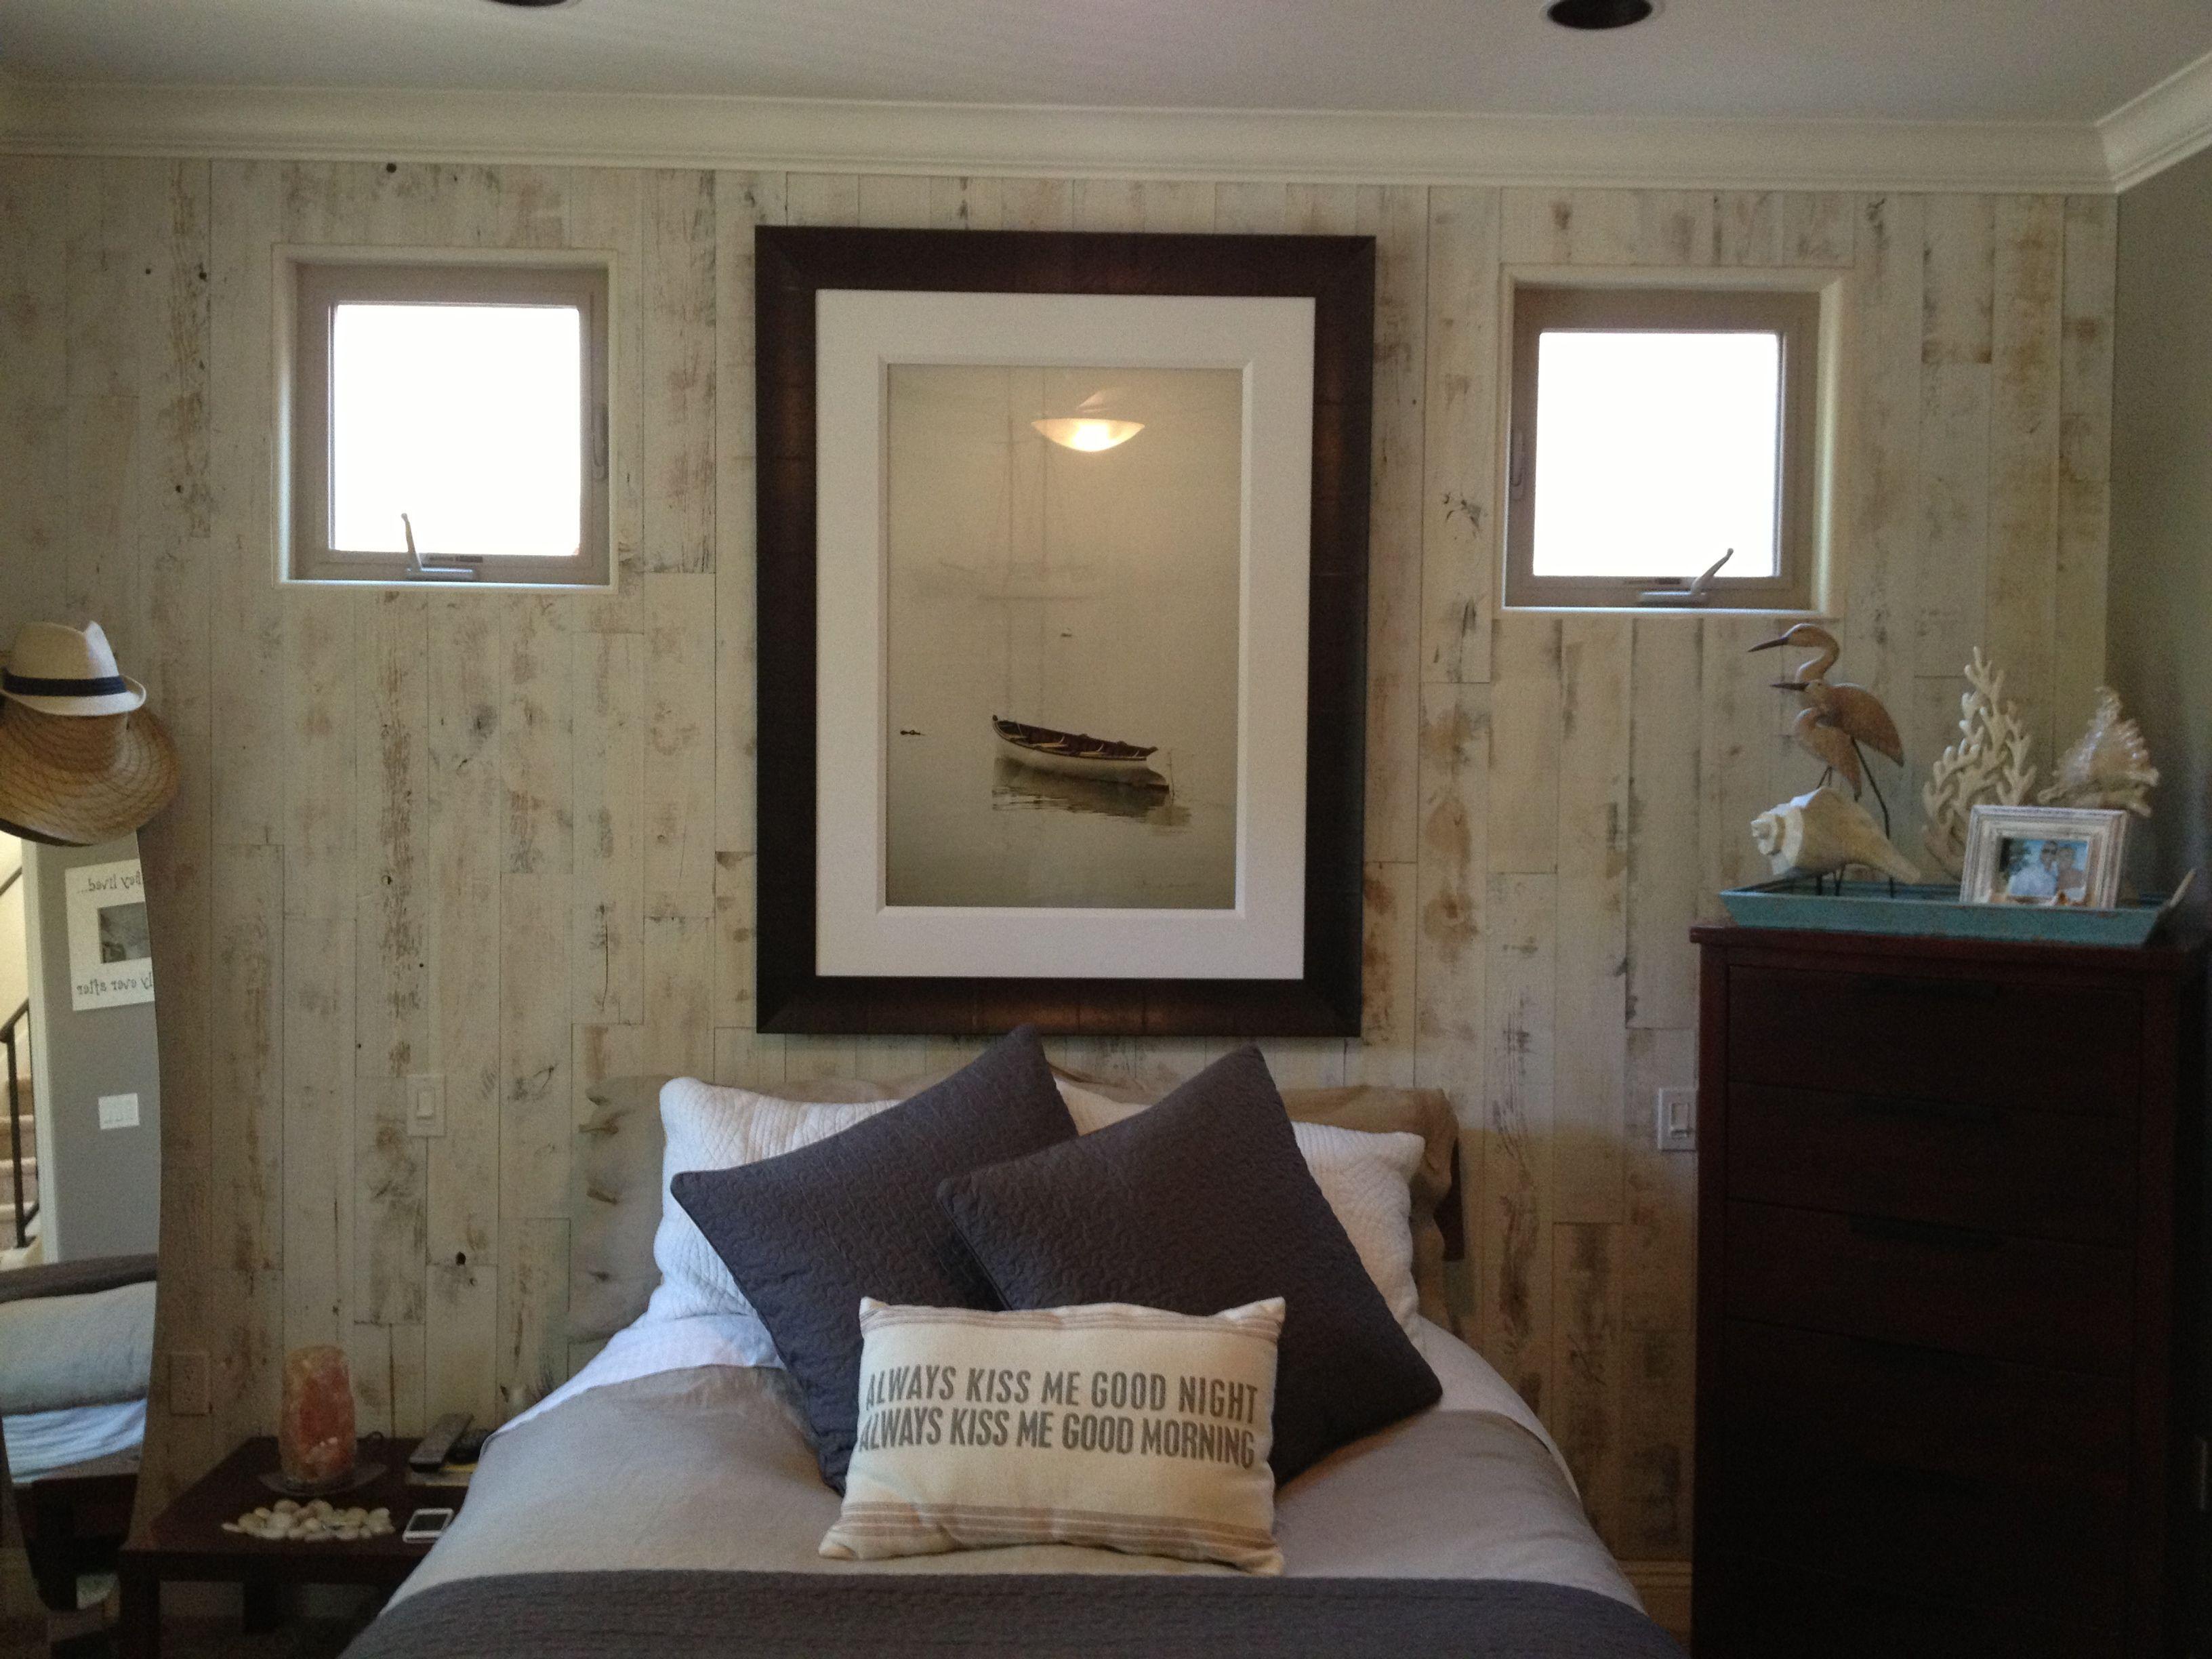 Self adhesive whitewash barnboard